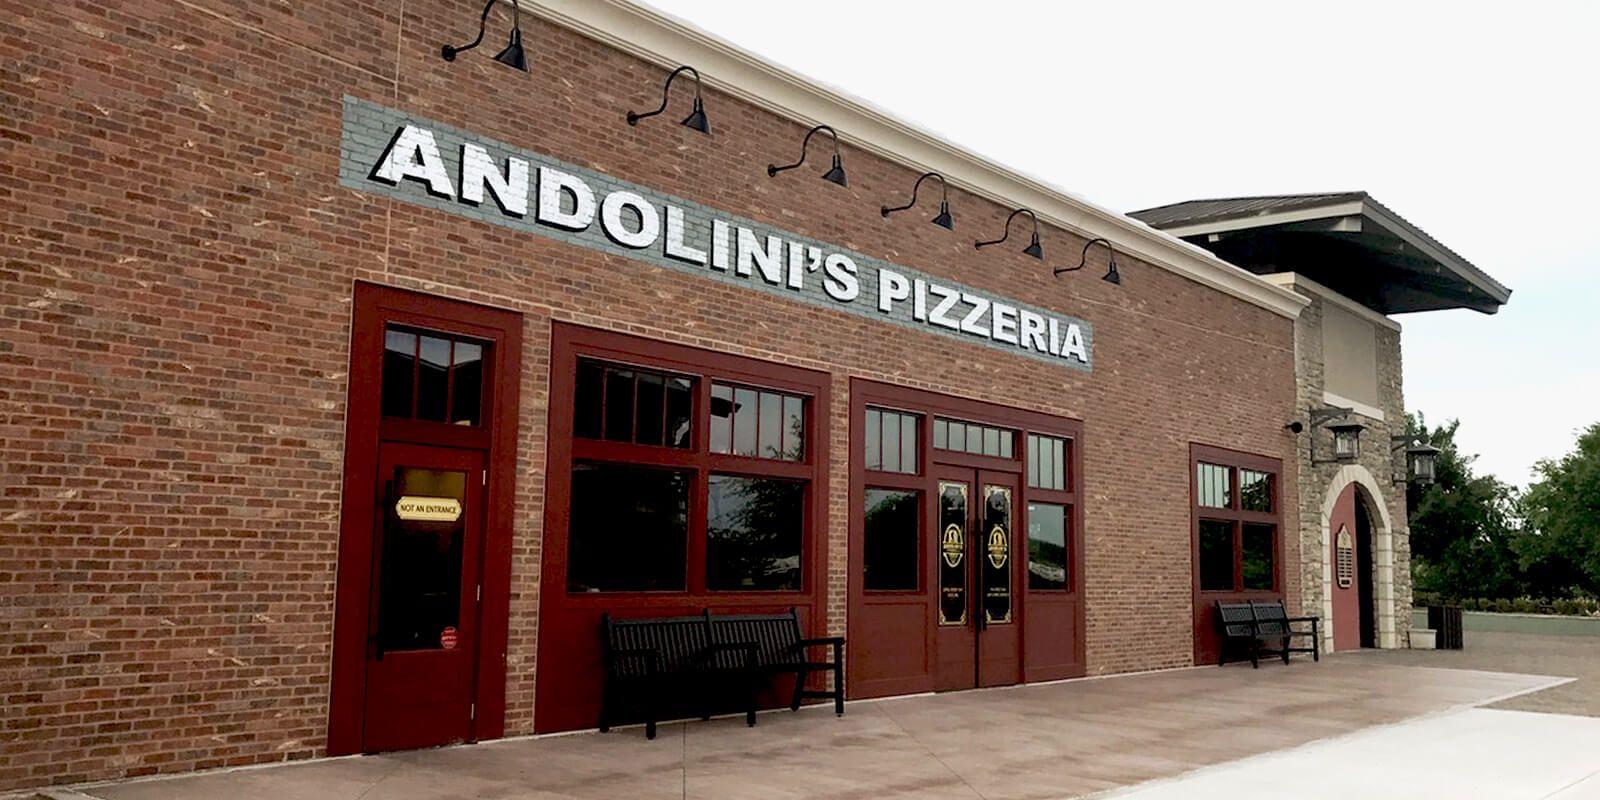 Andolinis pizzeria tulsa owasso broken arrow pizza